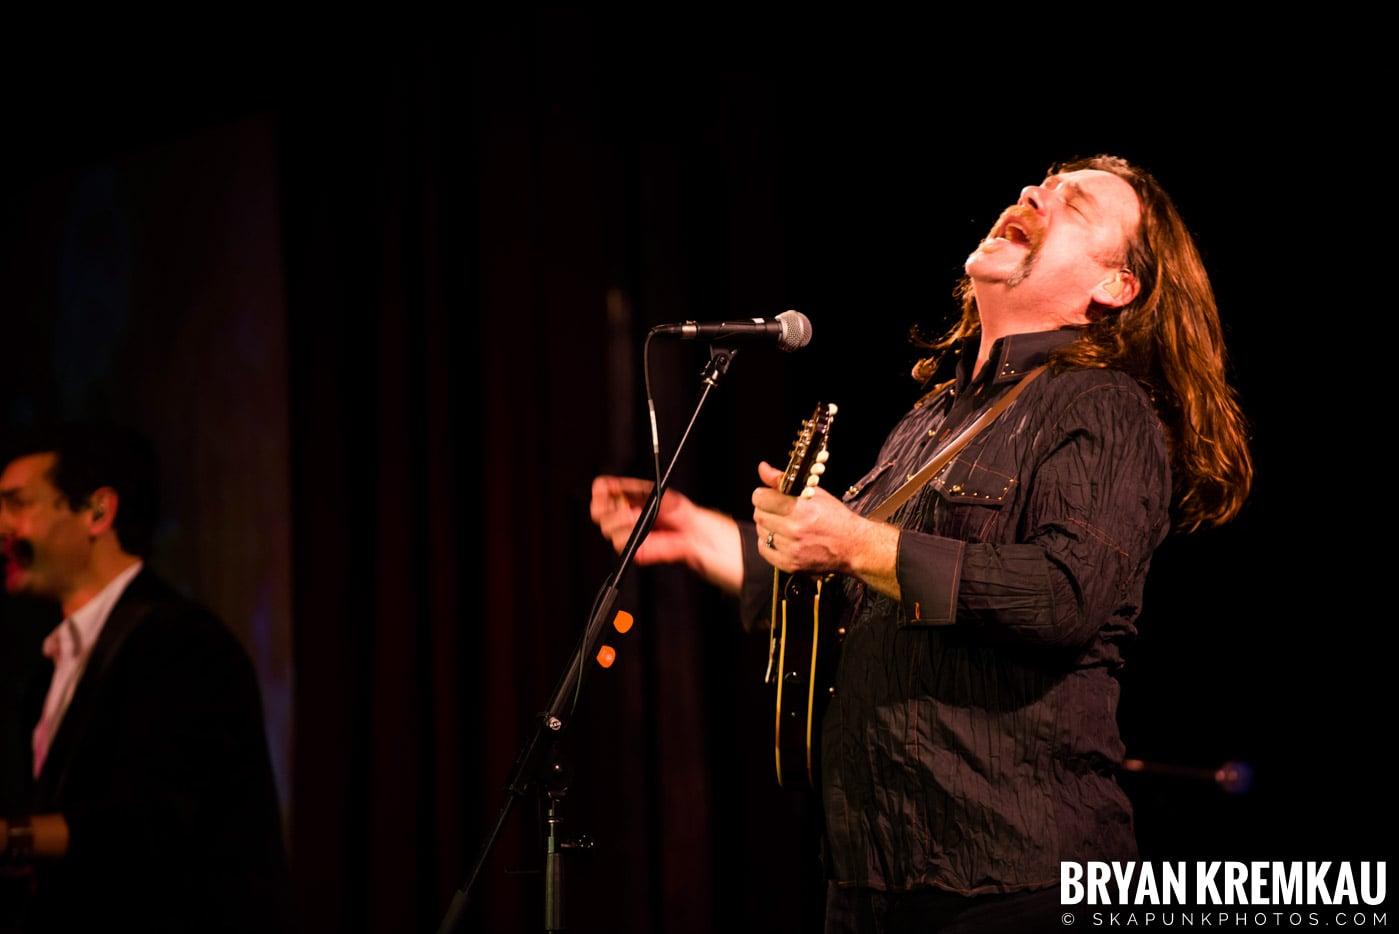 Alan Doyle @ B.B. King Blues & Grill, NYC - 1.11.13 (5)